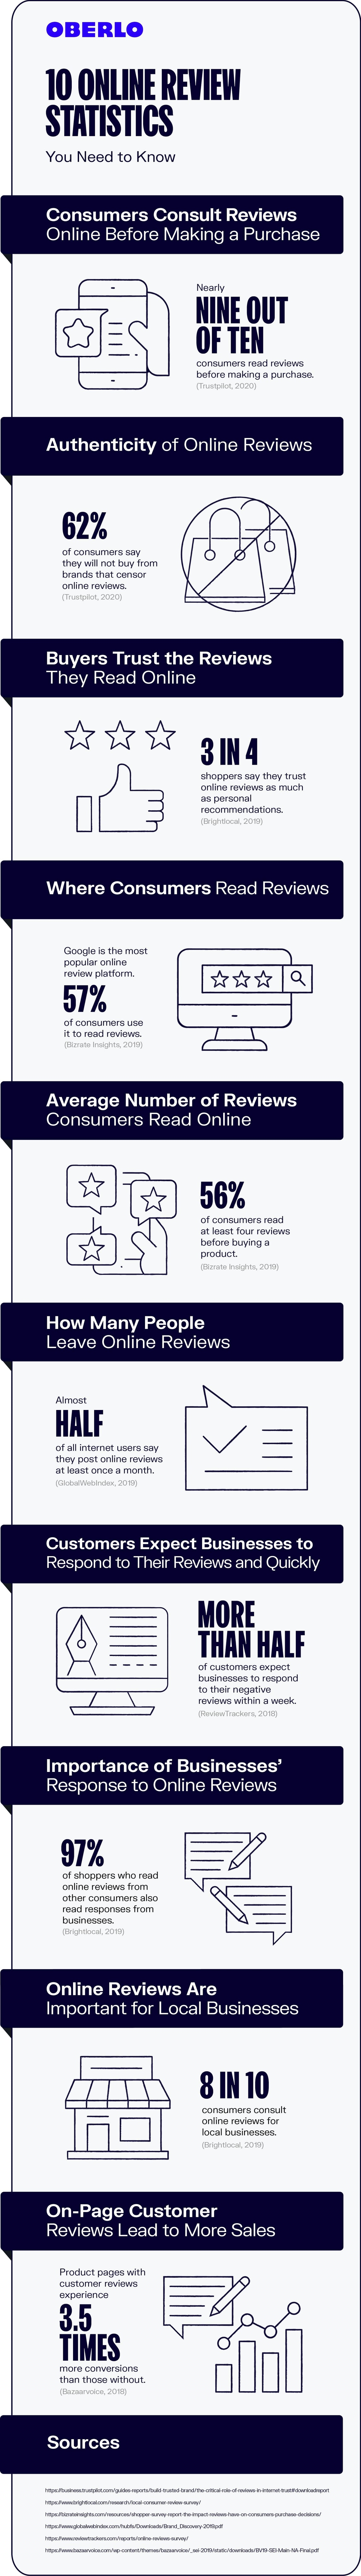 online review statistics 2020